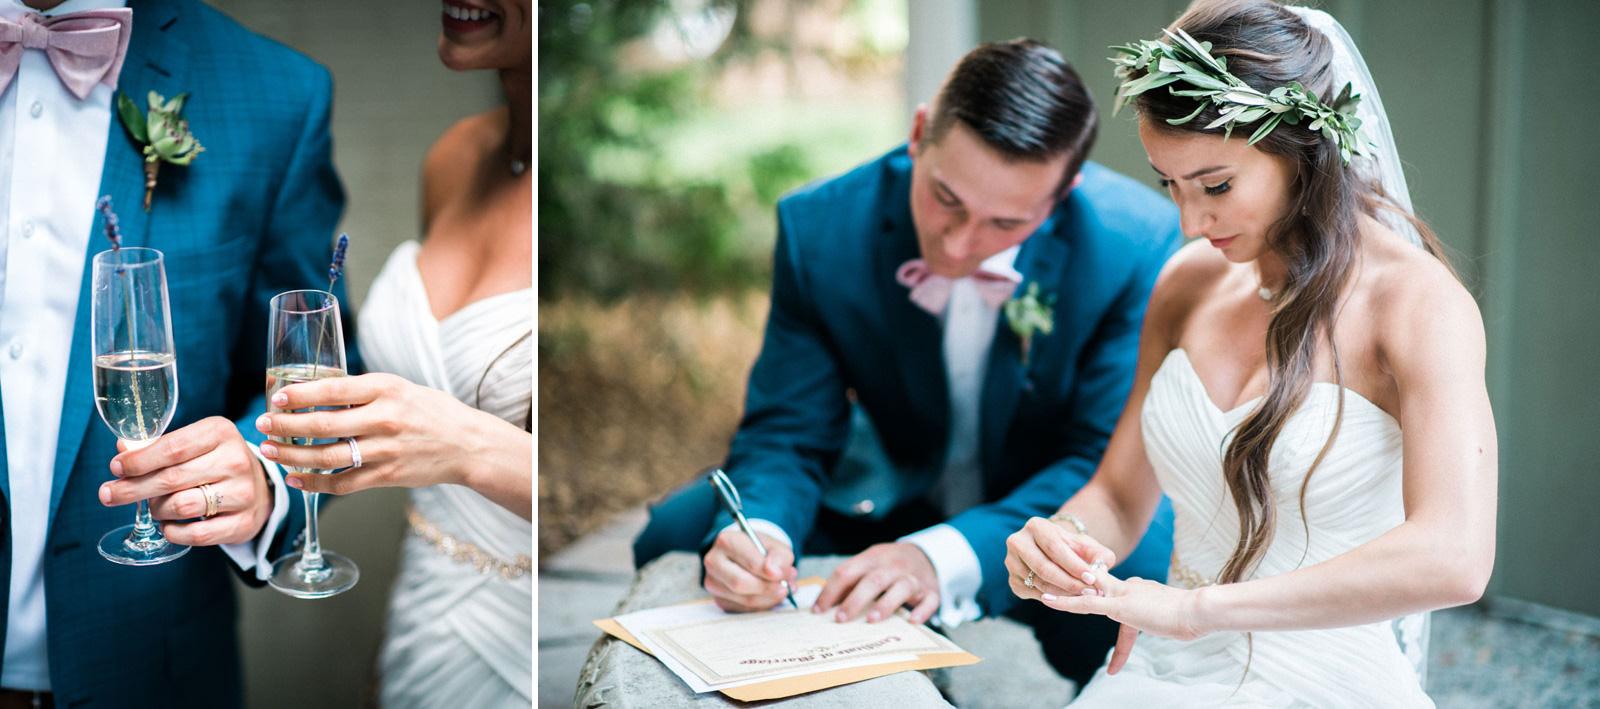 050-woodinville-lavendar-farm-wedding-with-golden-glowy-photos.jpg